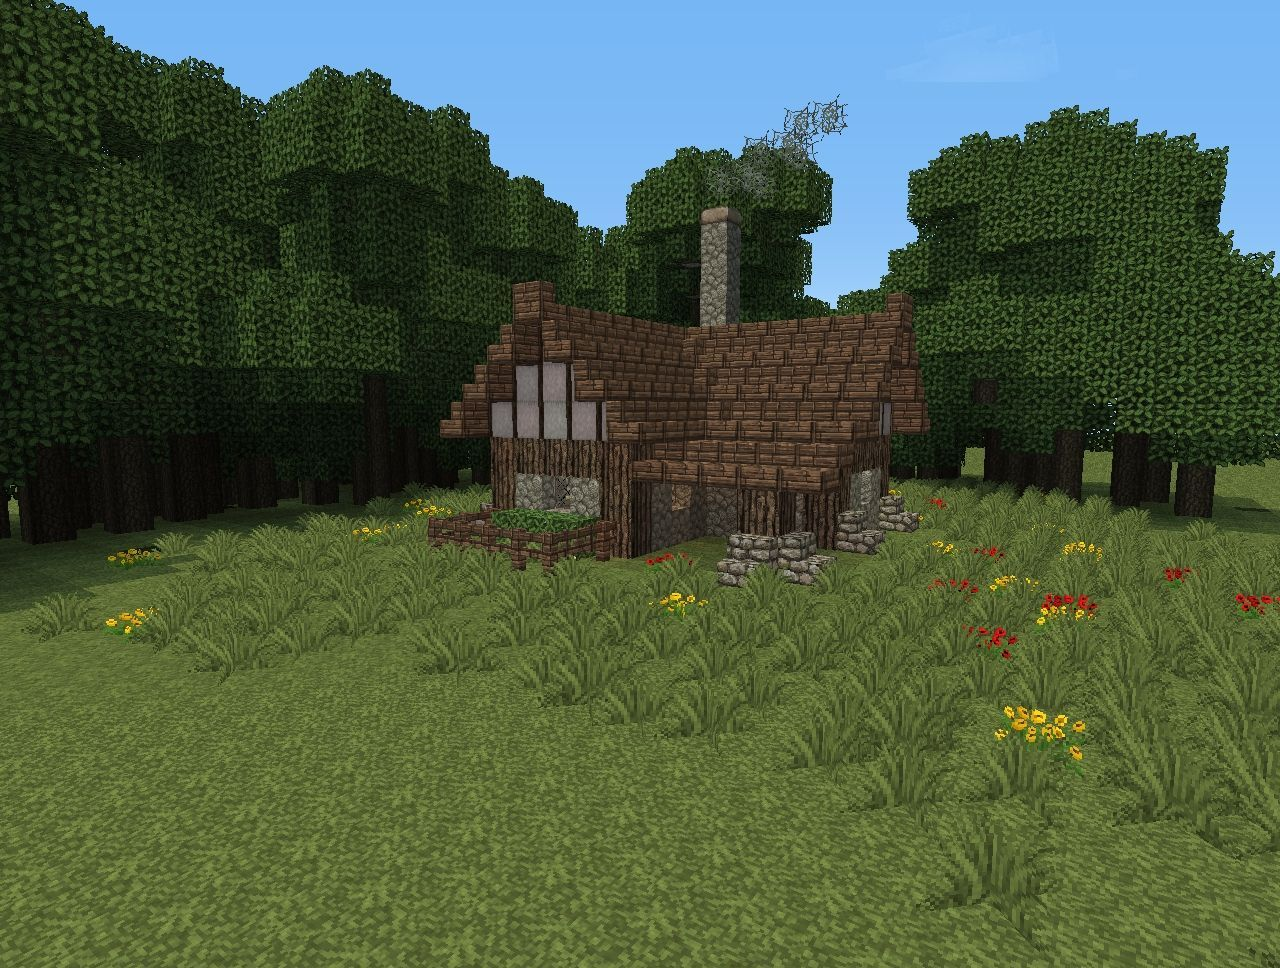 Minecraft Small House, Minecraft Houses